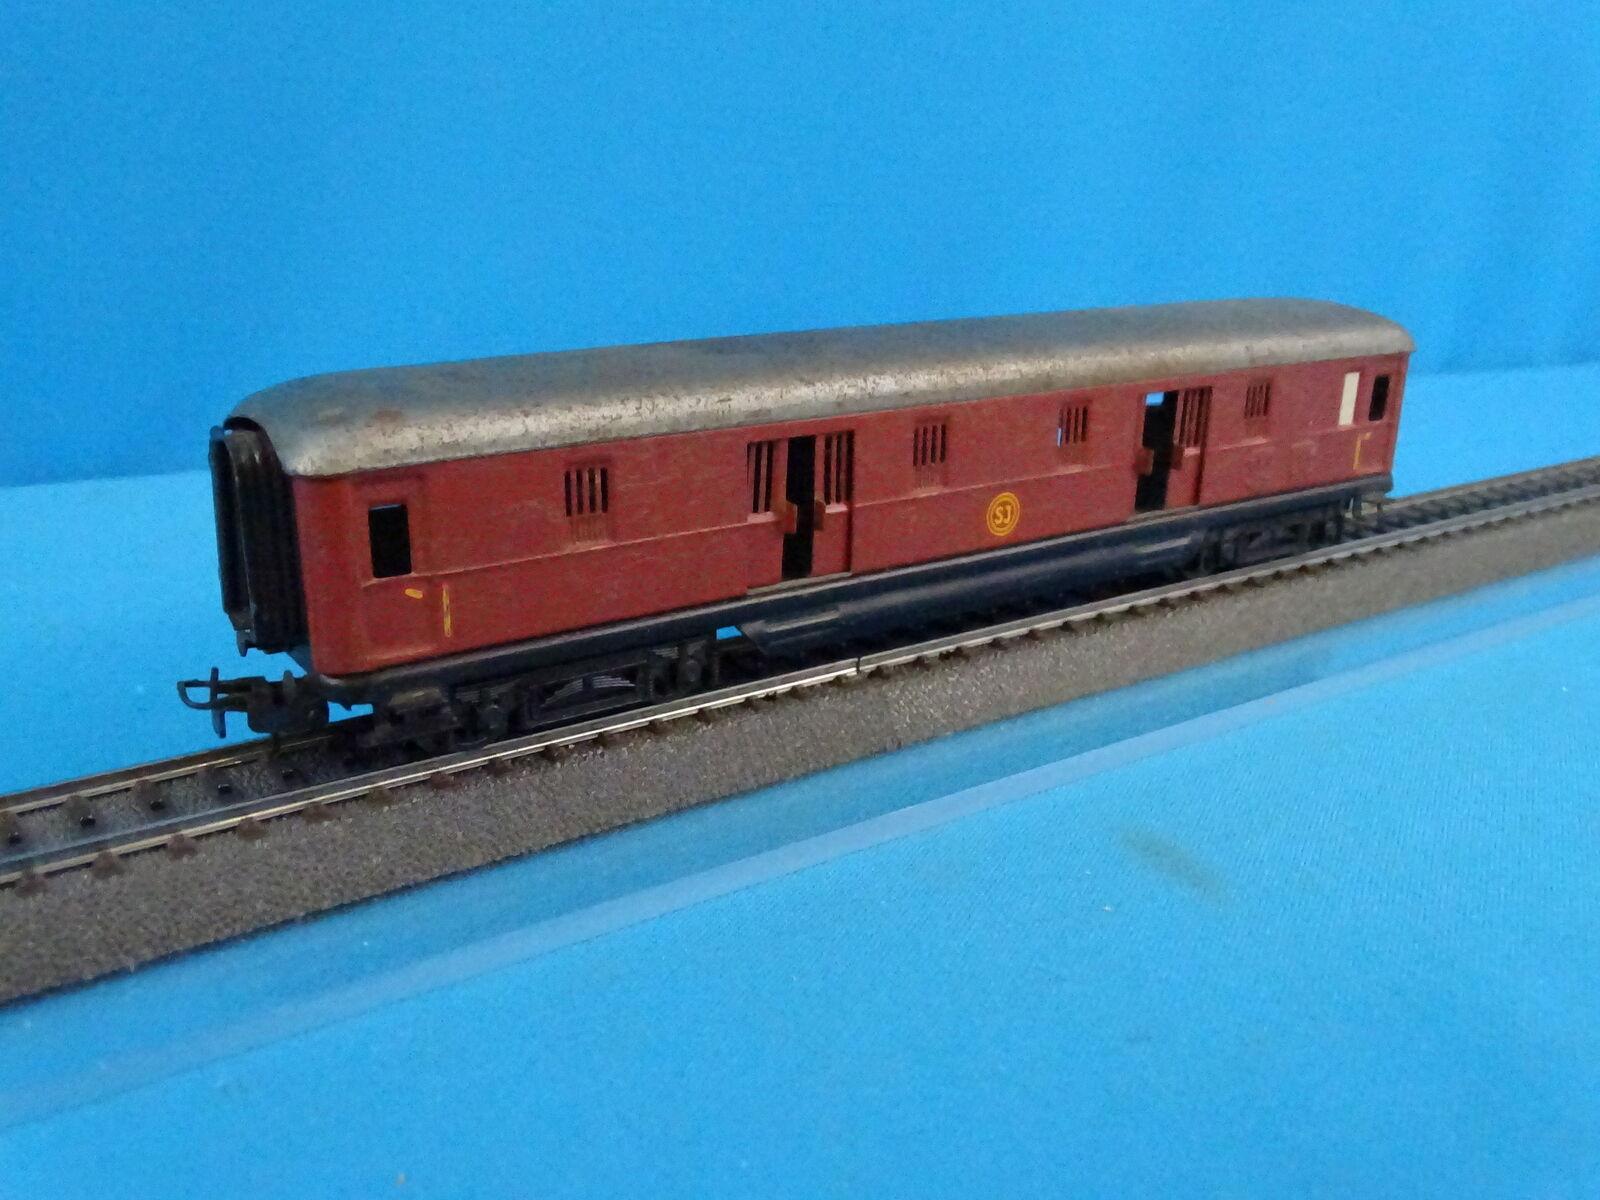 Marklin SJ 4021 Express Train Bagage Car Marronee Tin Plate 2